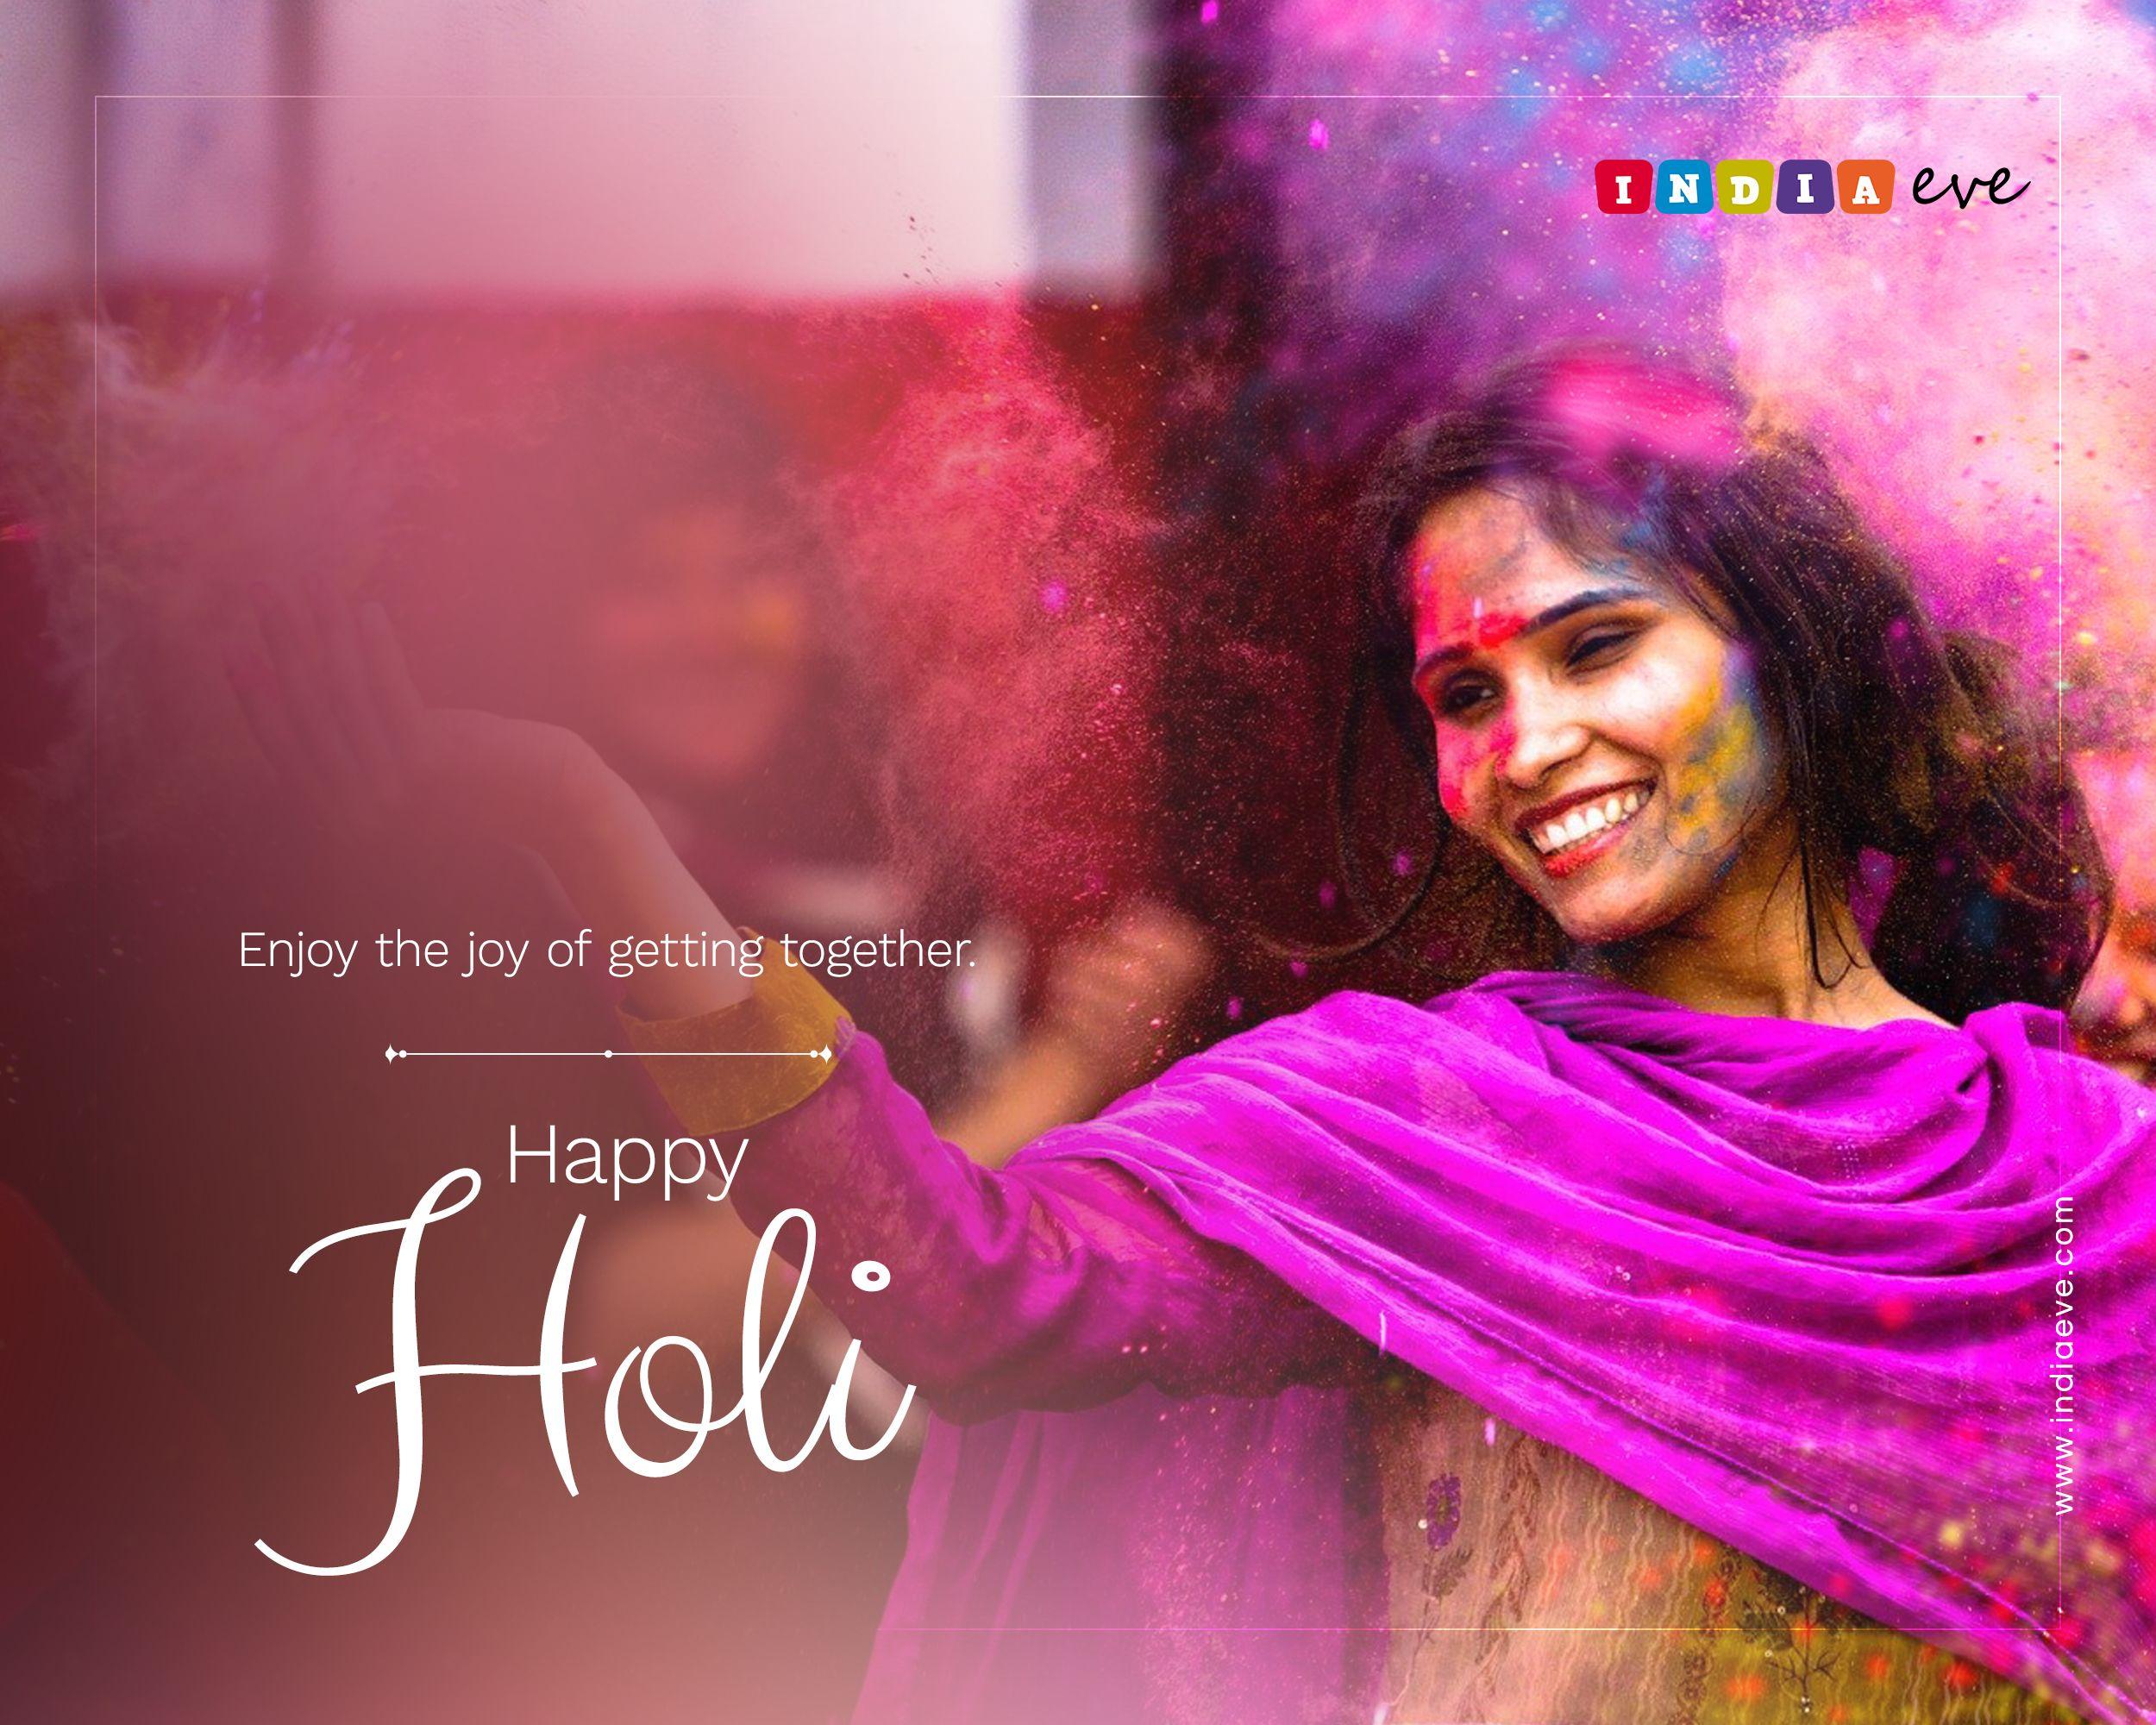 Enjoy the very spirit of festivity and the bright hues of life. Wish you all happy and blessed Holi!  #happyholi #holi #holi2020 #festivalofcolors #indiaeve #teamindiaeve